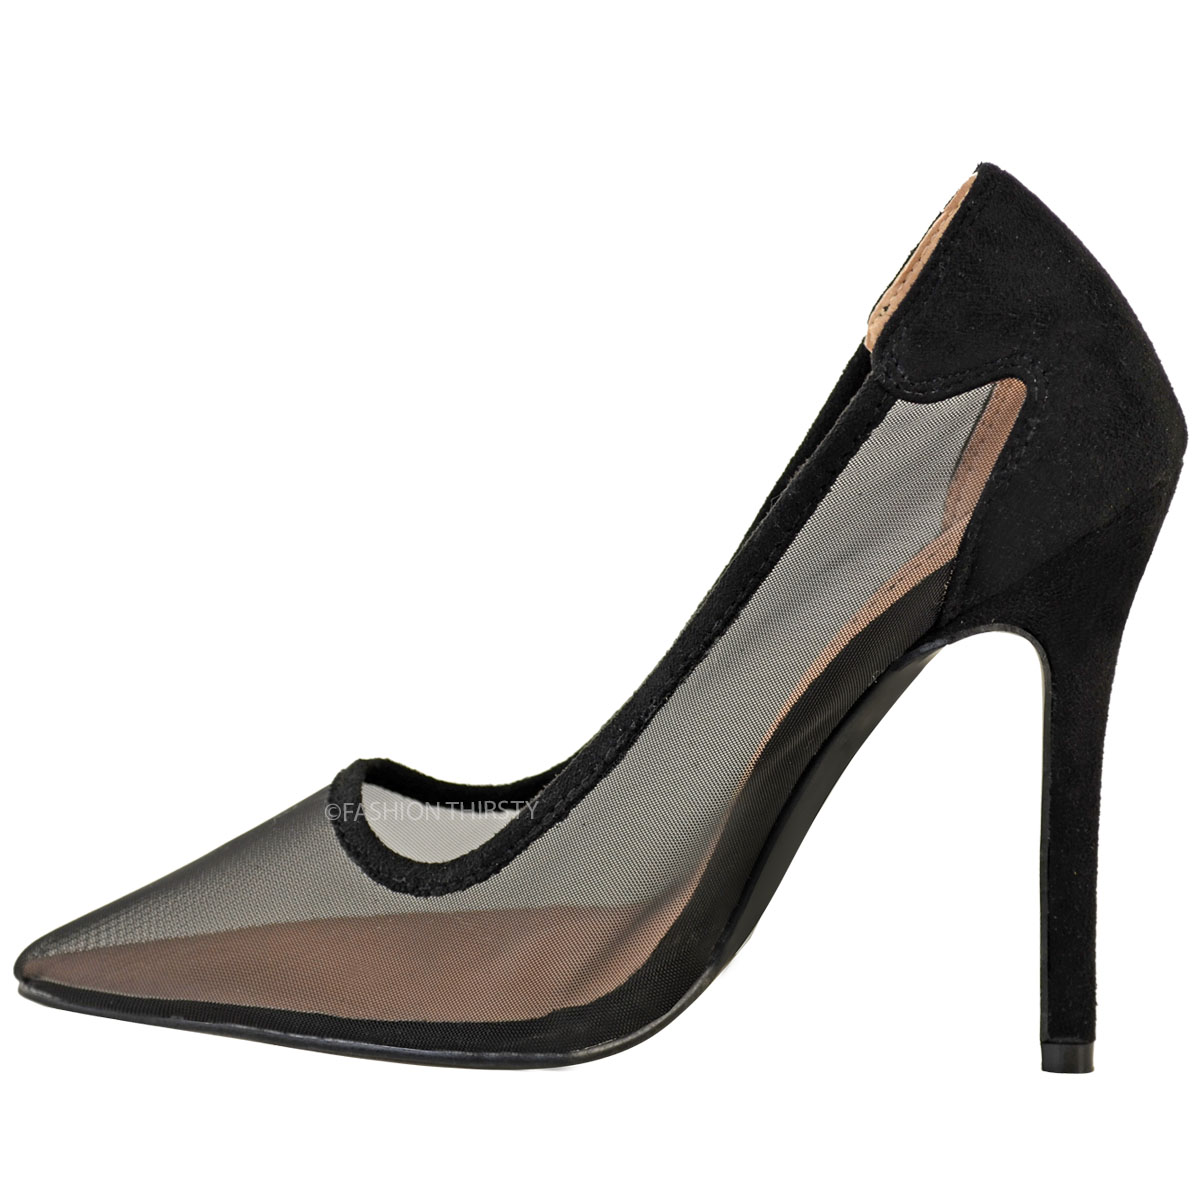 High Heel Court Shoes Ebay